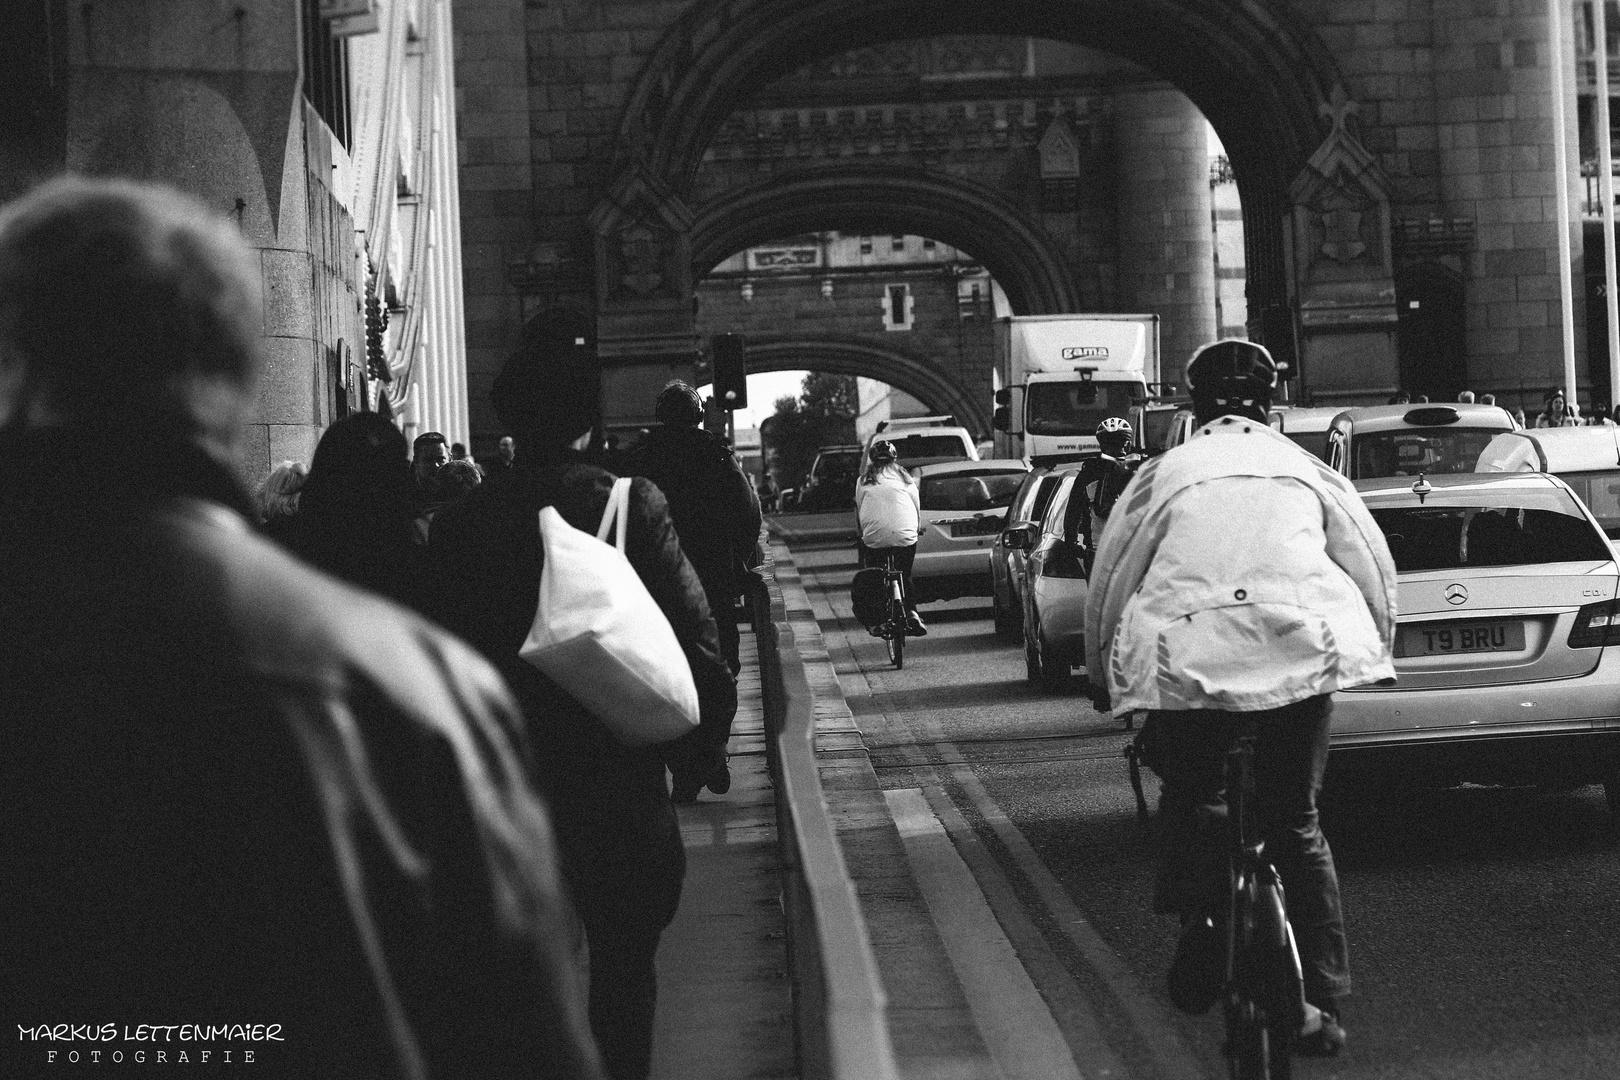 Traffic on the Tower Bridge